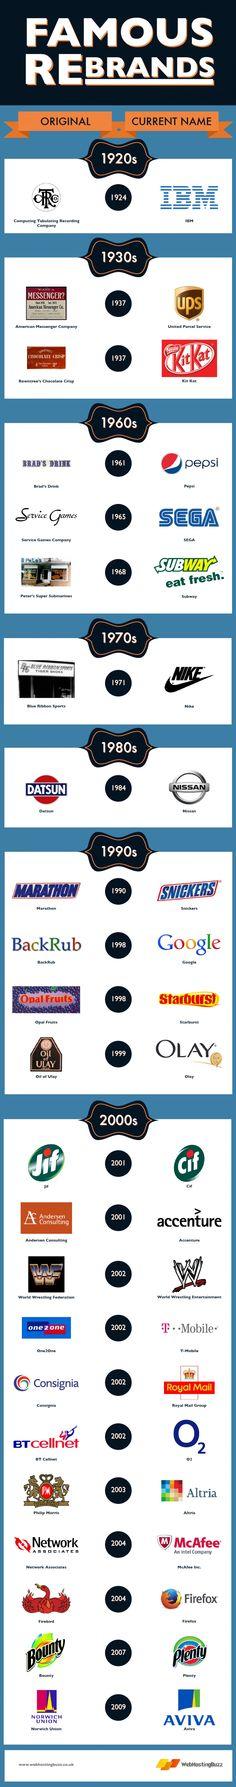 Il restyling del logo è quasi sempre una pratica indispensabile.